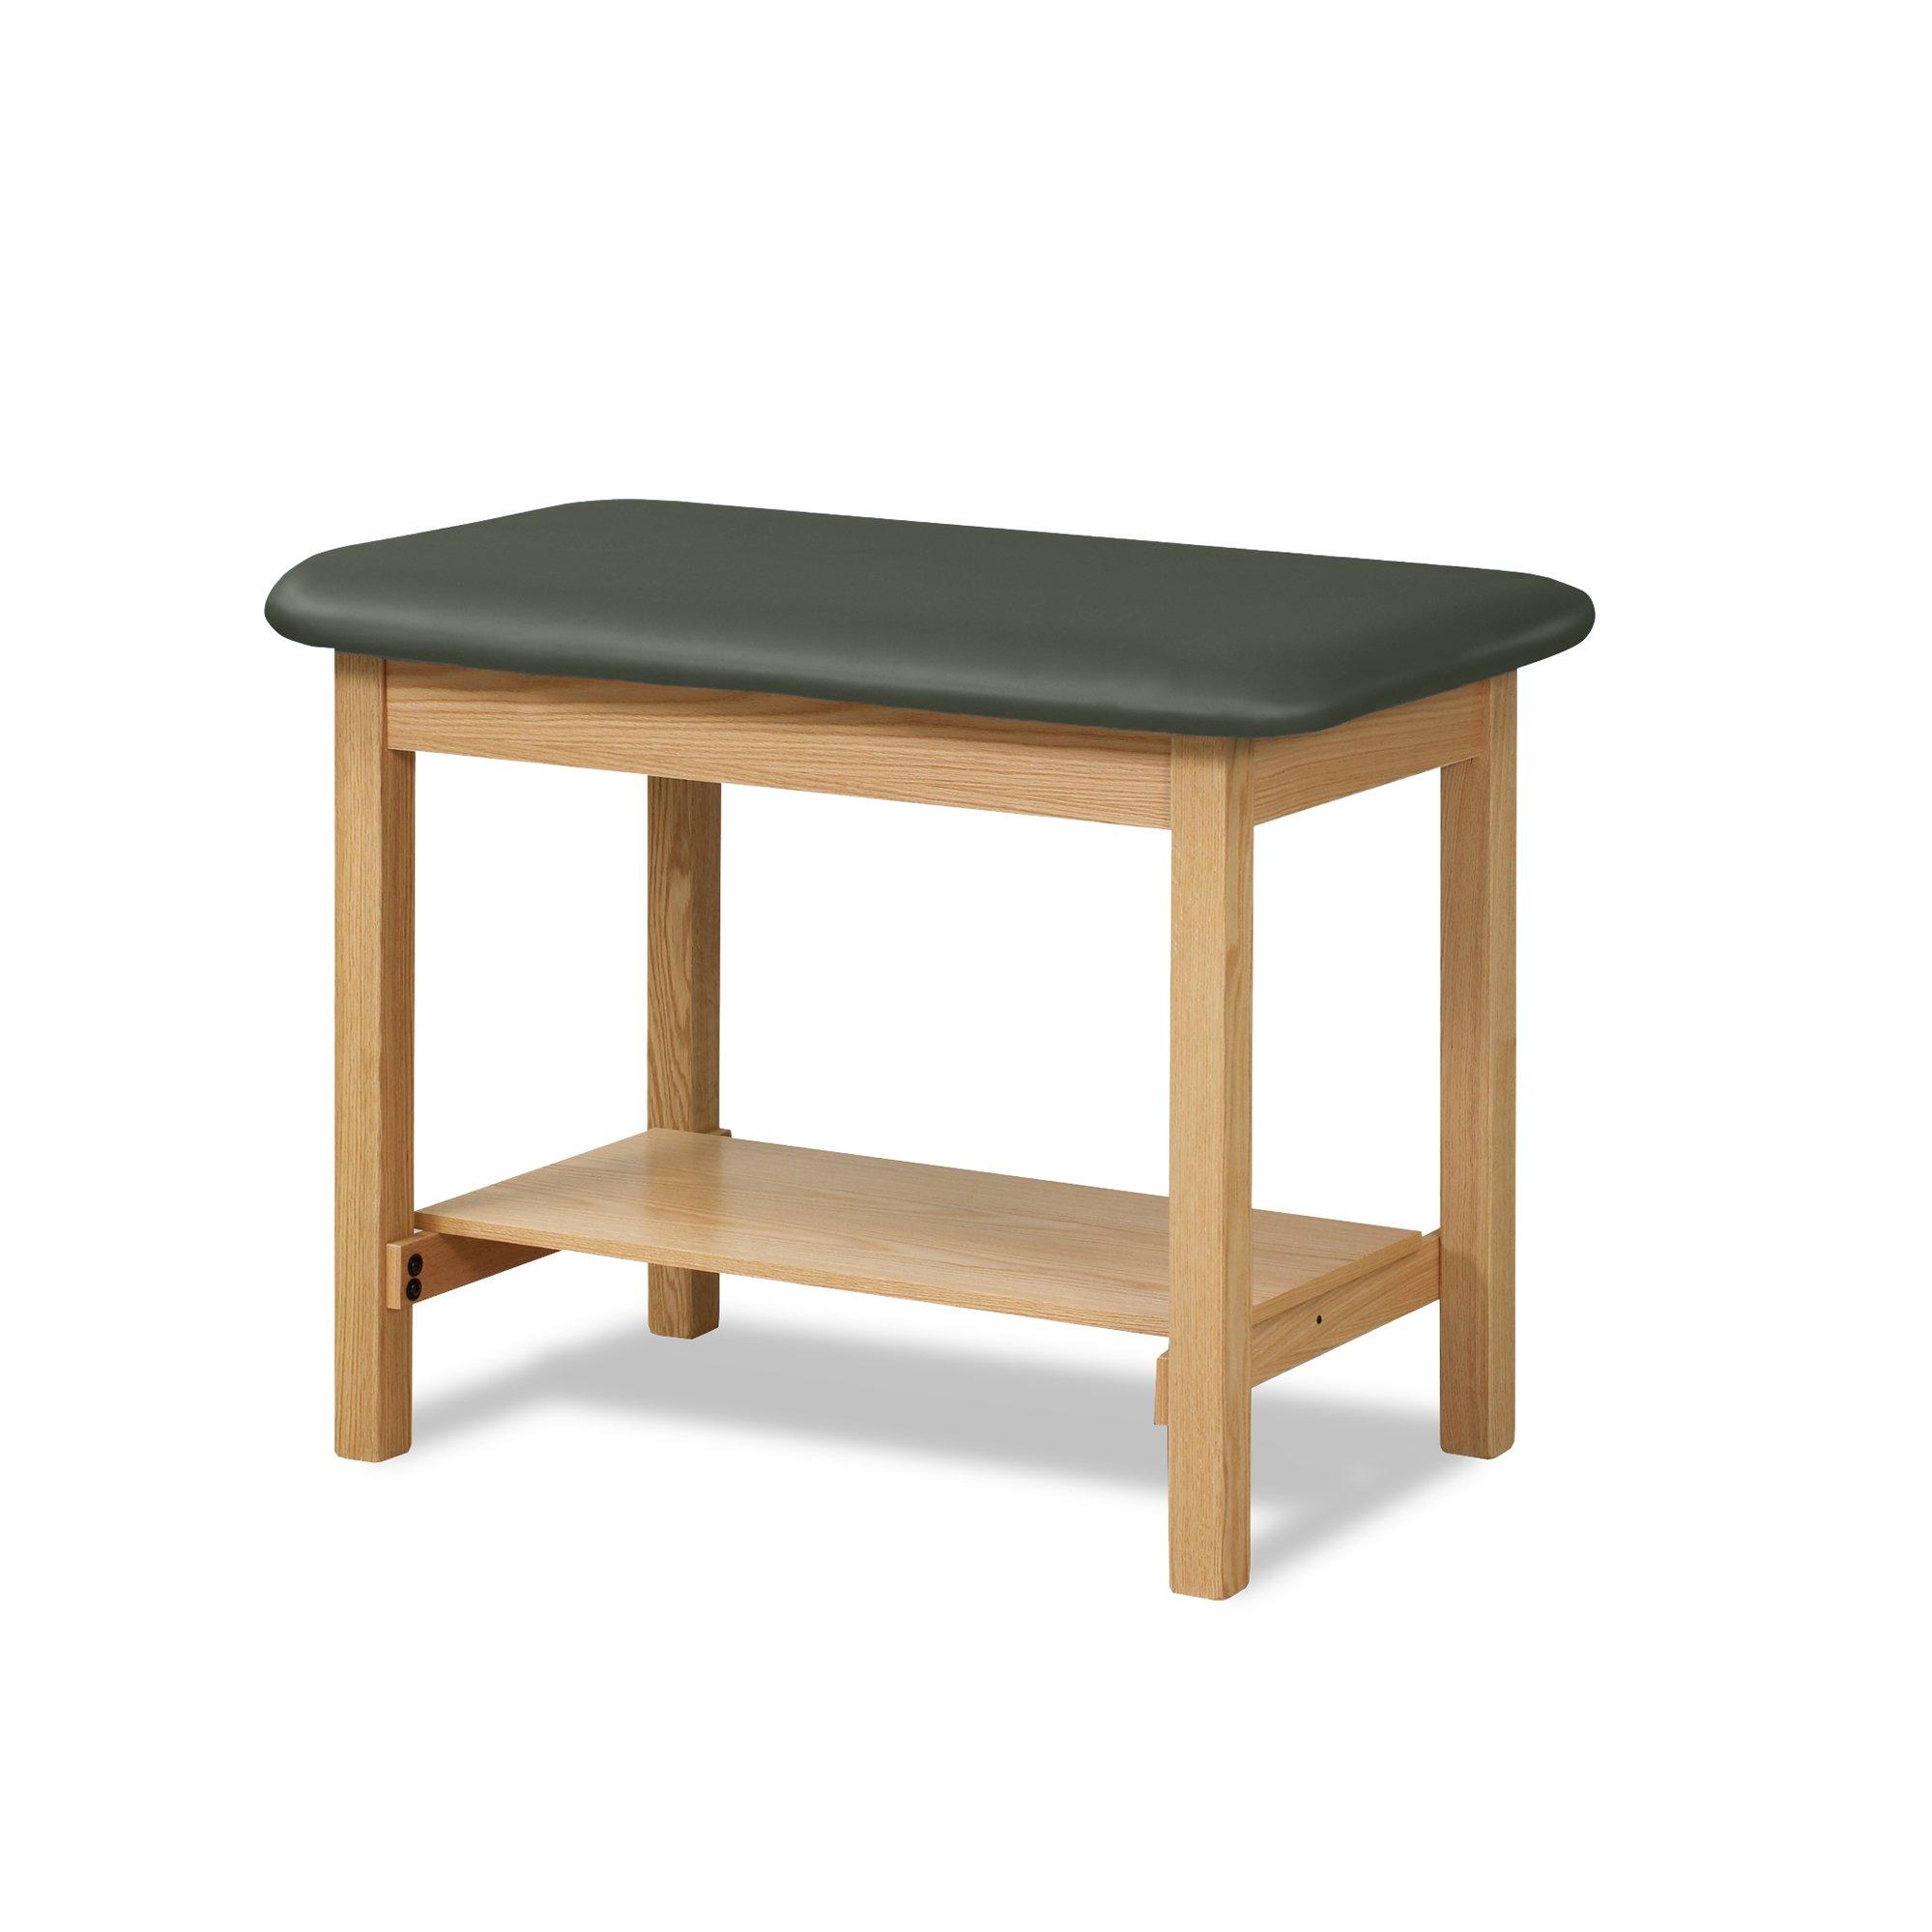 27'' Width Taping Table with Shelf-Gunmetal